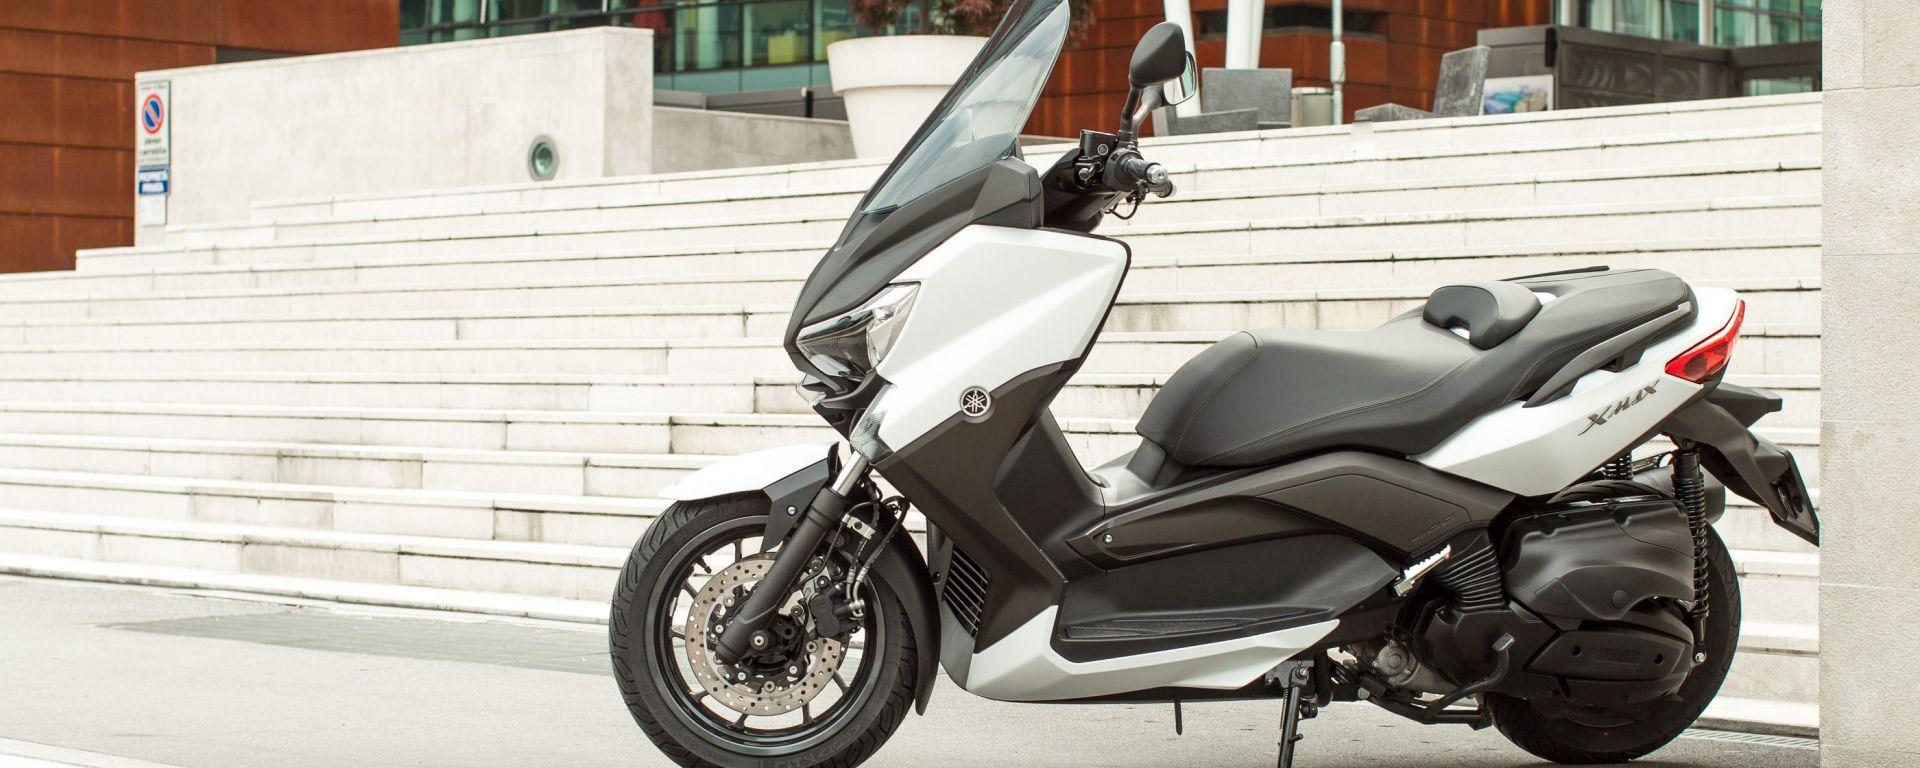 Porte aperte Yamaha X-Max 400